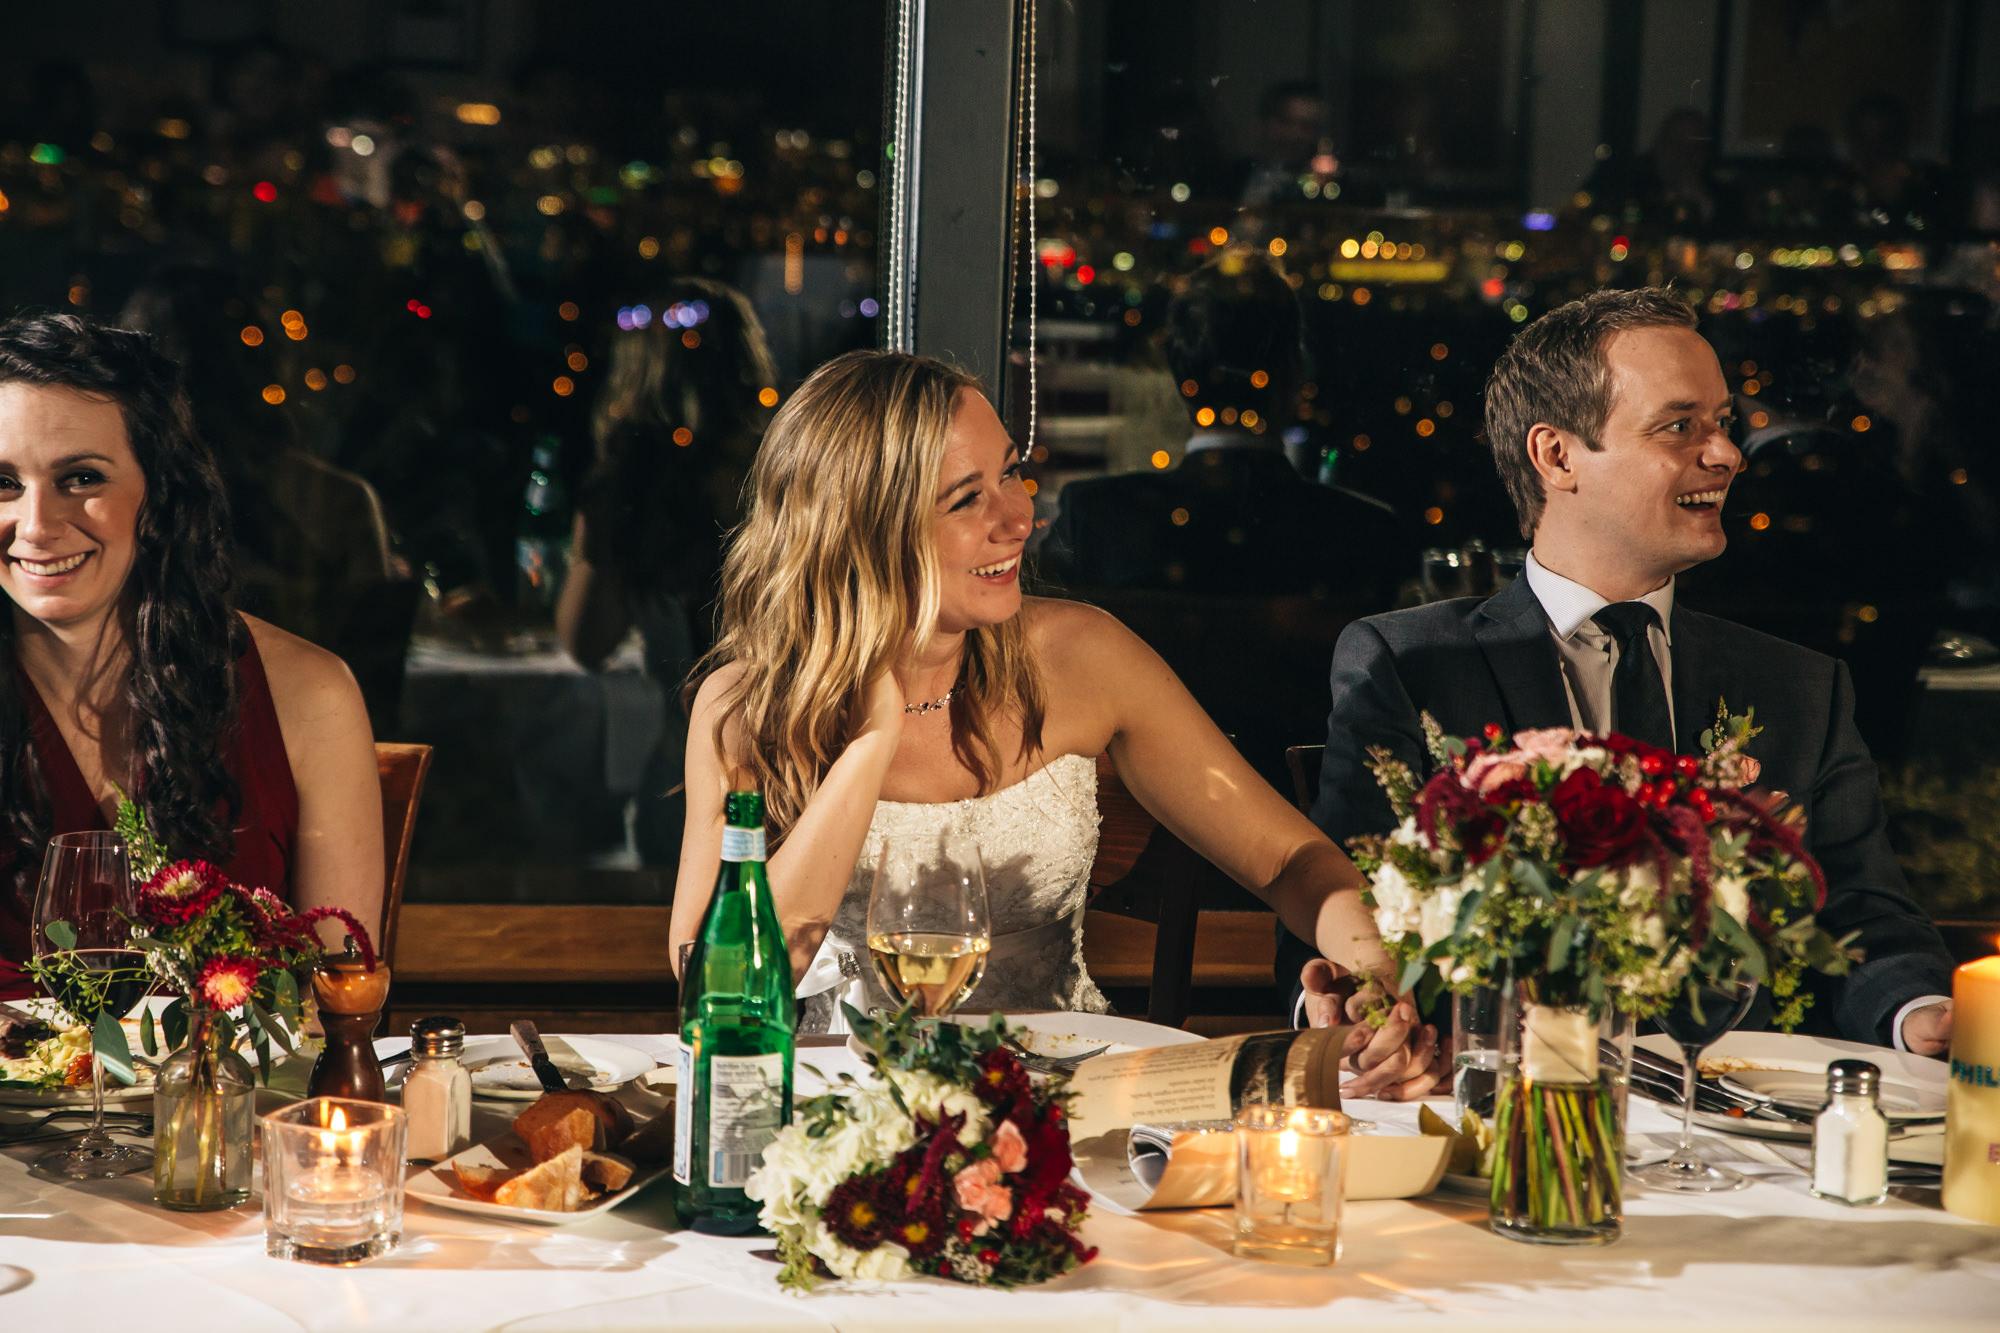 68-seasons-in-the-park-wedding-reception.jpg